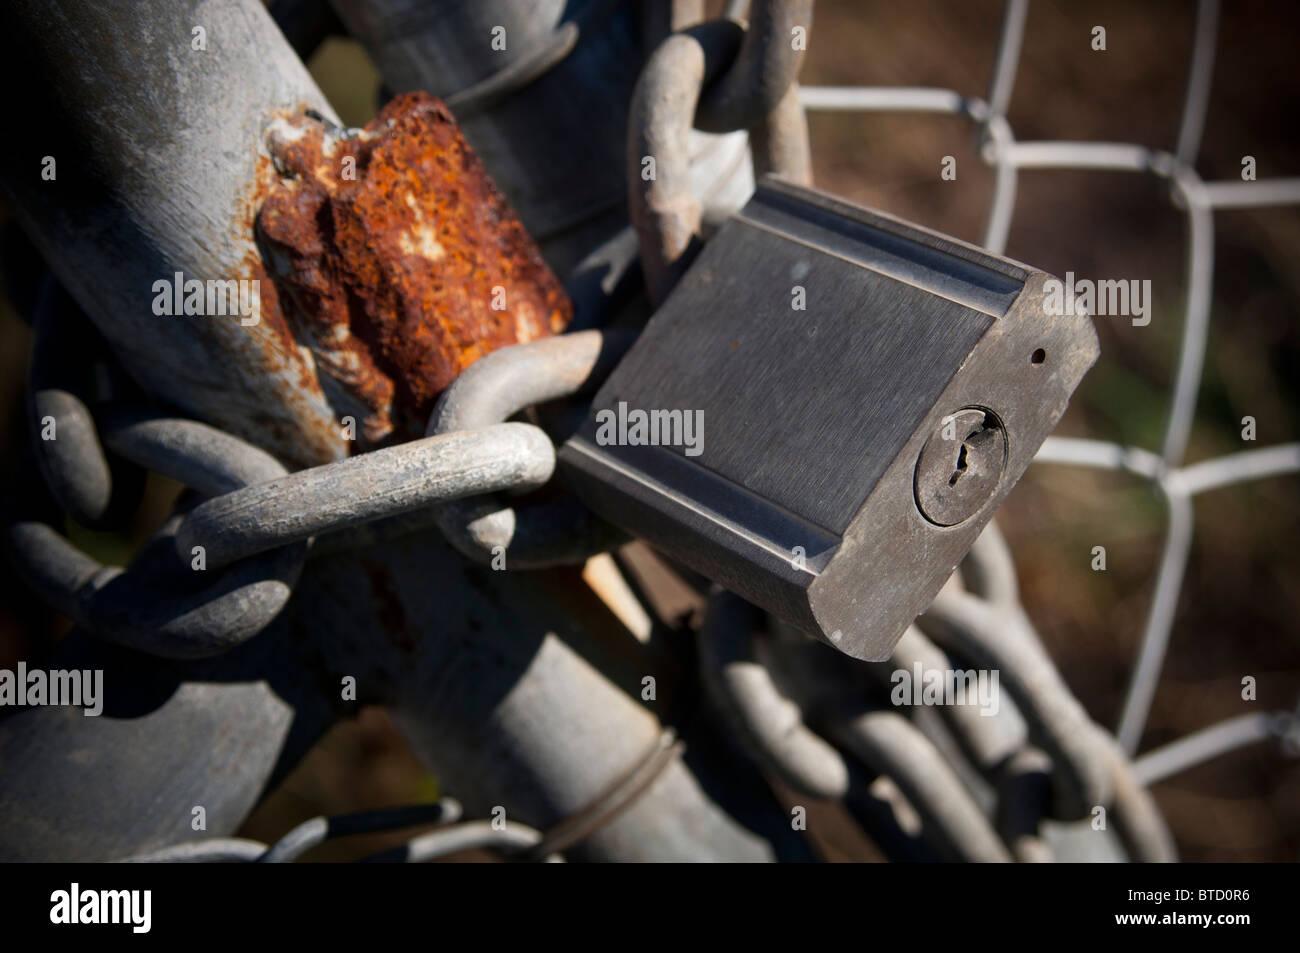 Fein Große Drahtrollen Fotos - Elektrische Schaltplan-Ideen ...